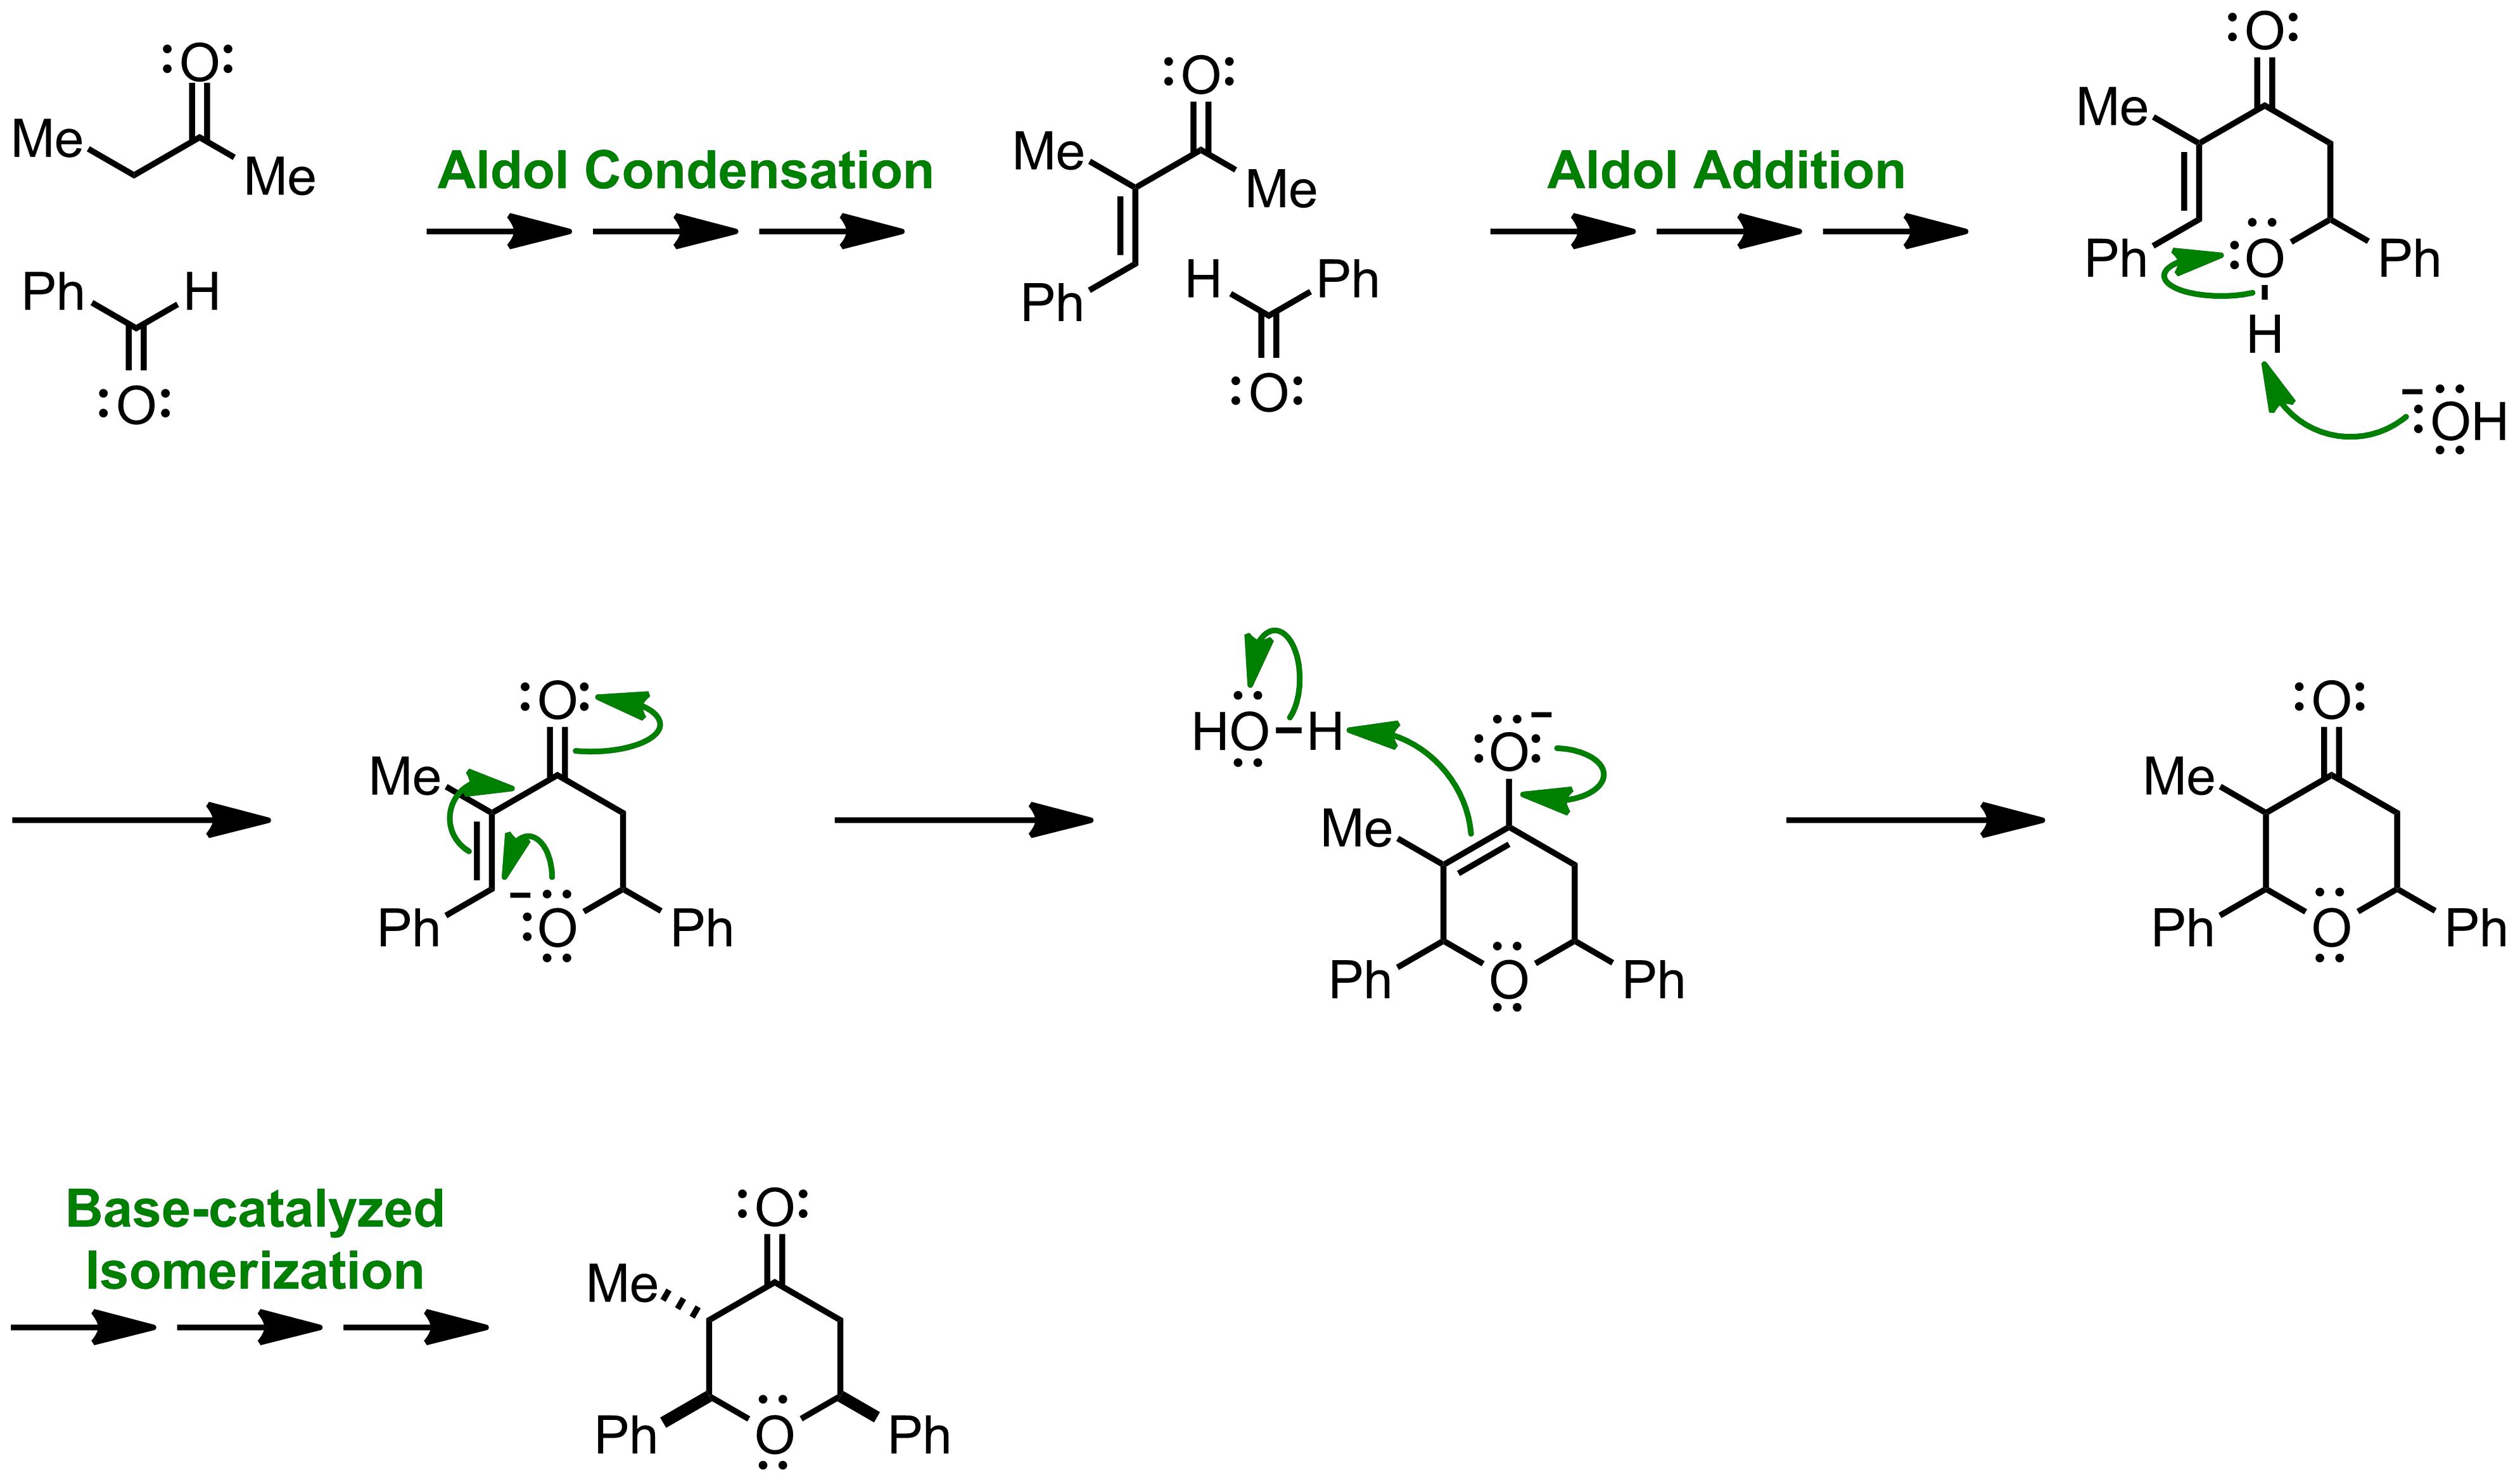 Mechanism of the Maitland-Japp Reaction